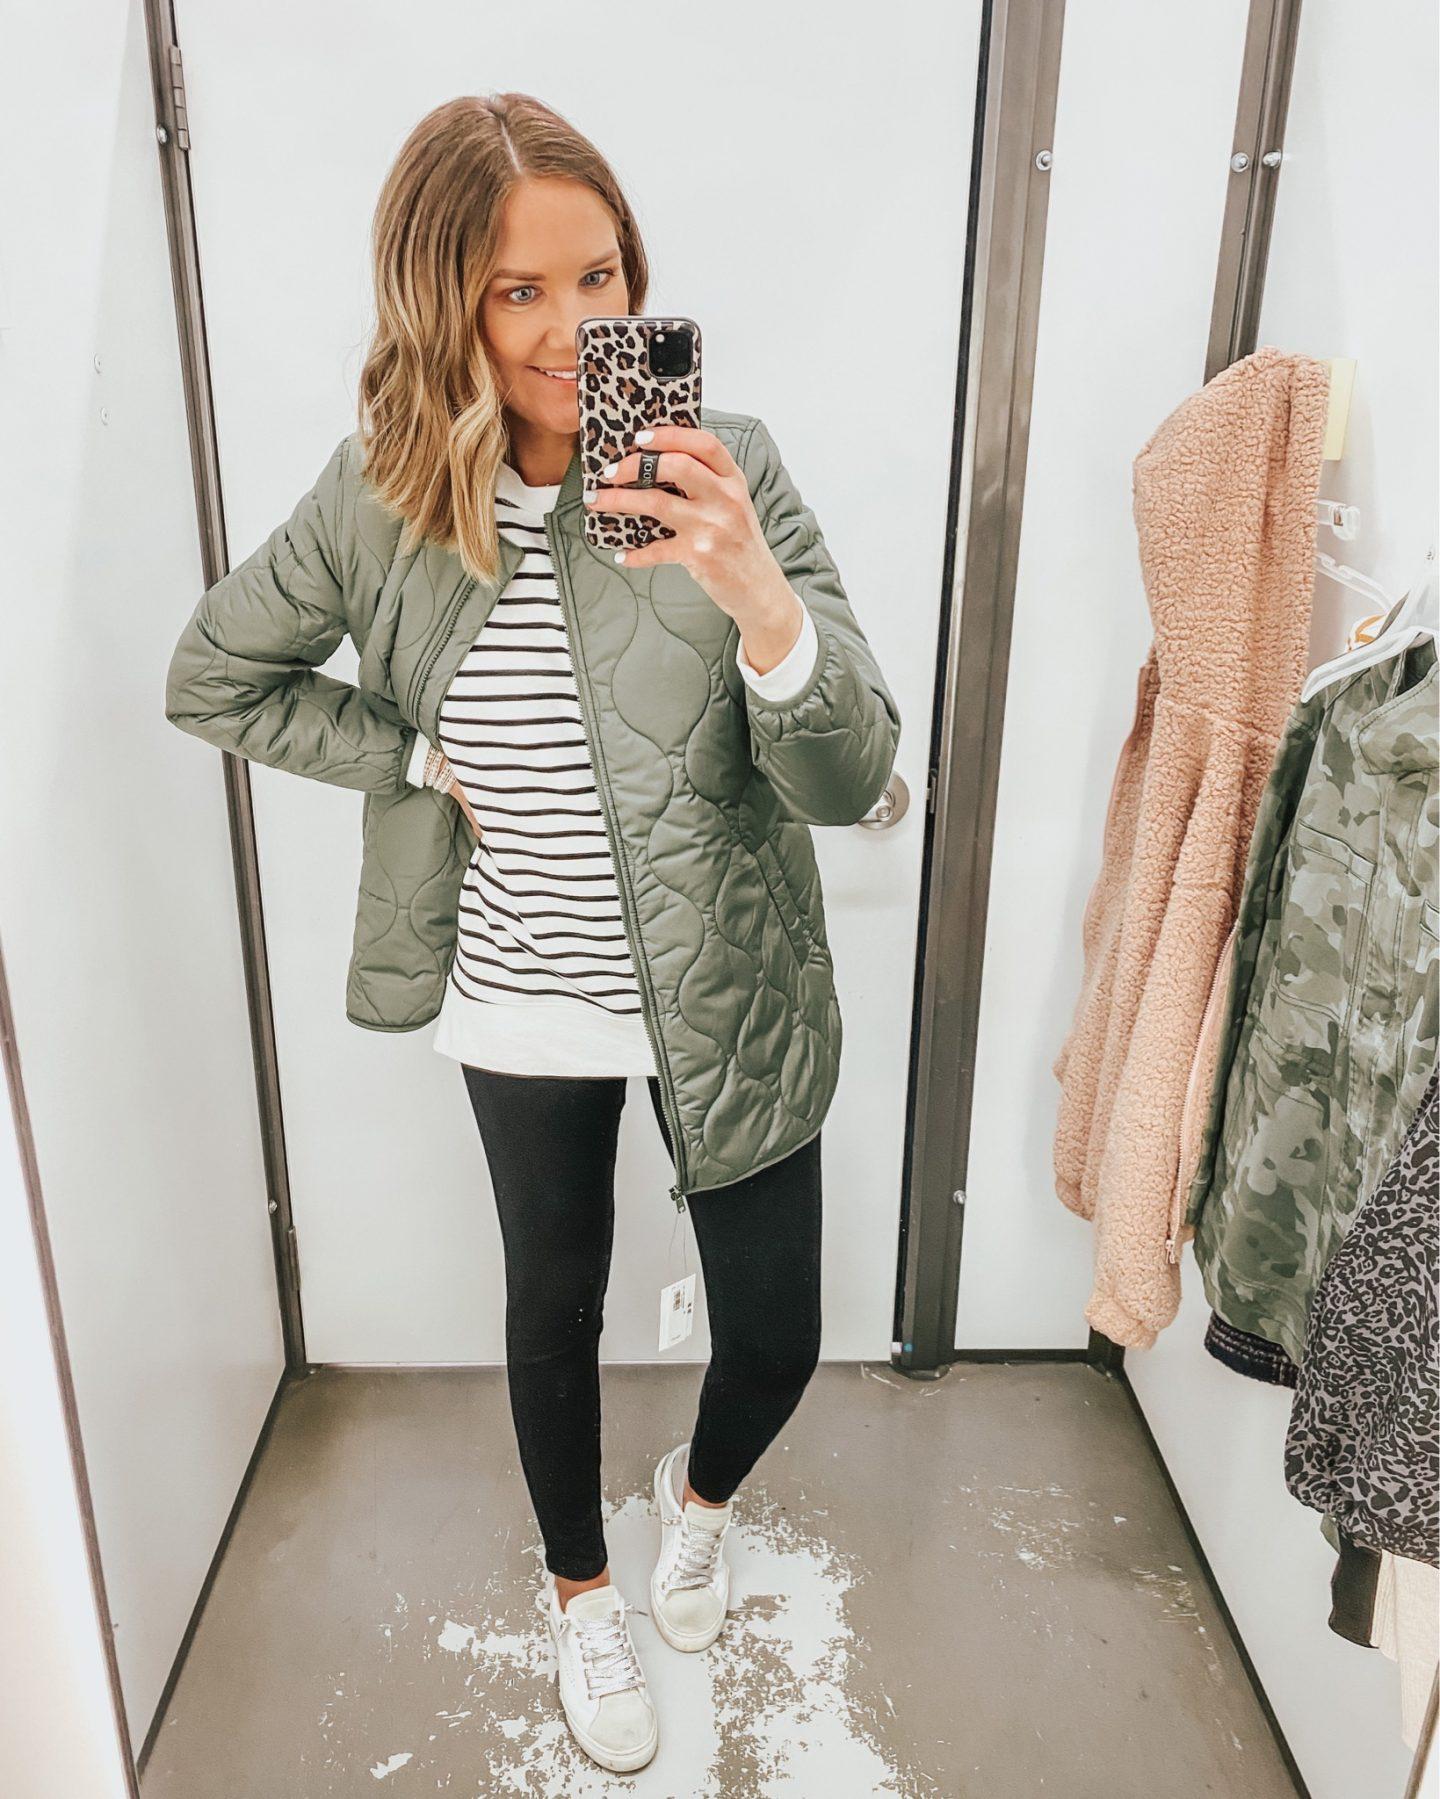 mom-style-casual-style-striped-tunic-sweatshirt